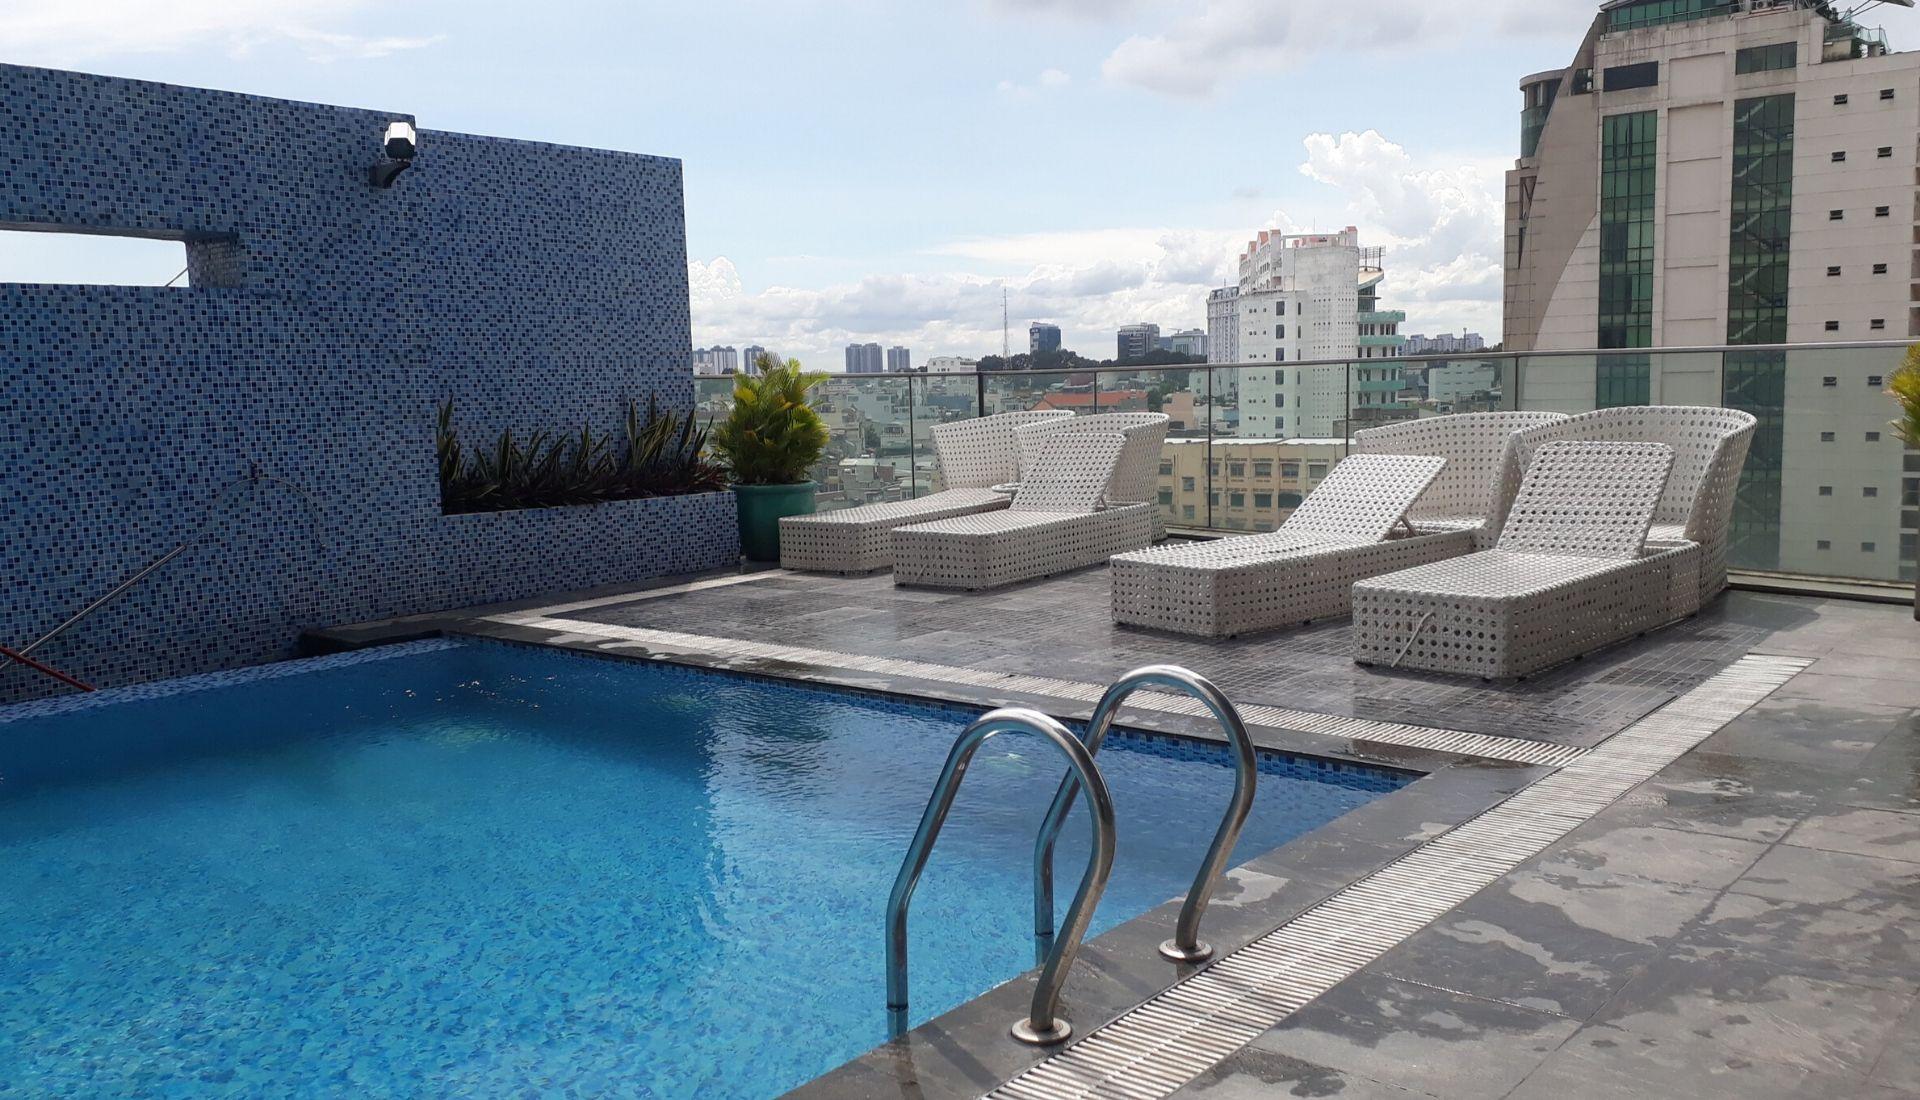 Swimming Pool at the Pullman Saigon Centre Hotel 5 days in Saigon